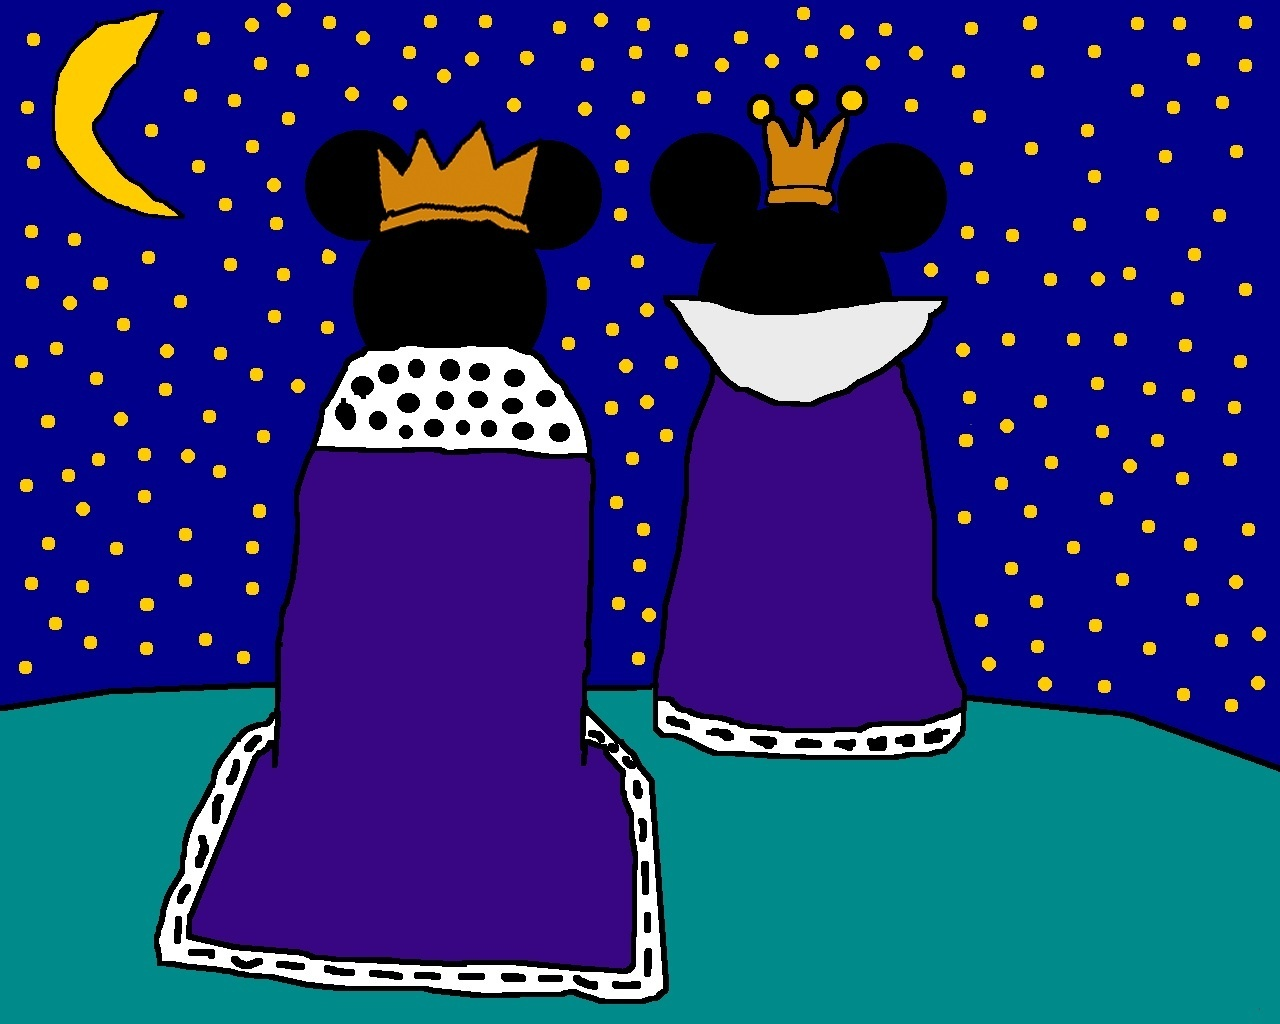 Prince mickey and princess minnie mickey donald goofy - Princesse minnie ...